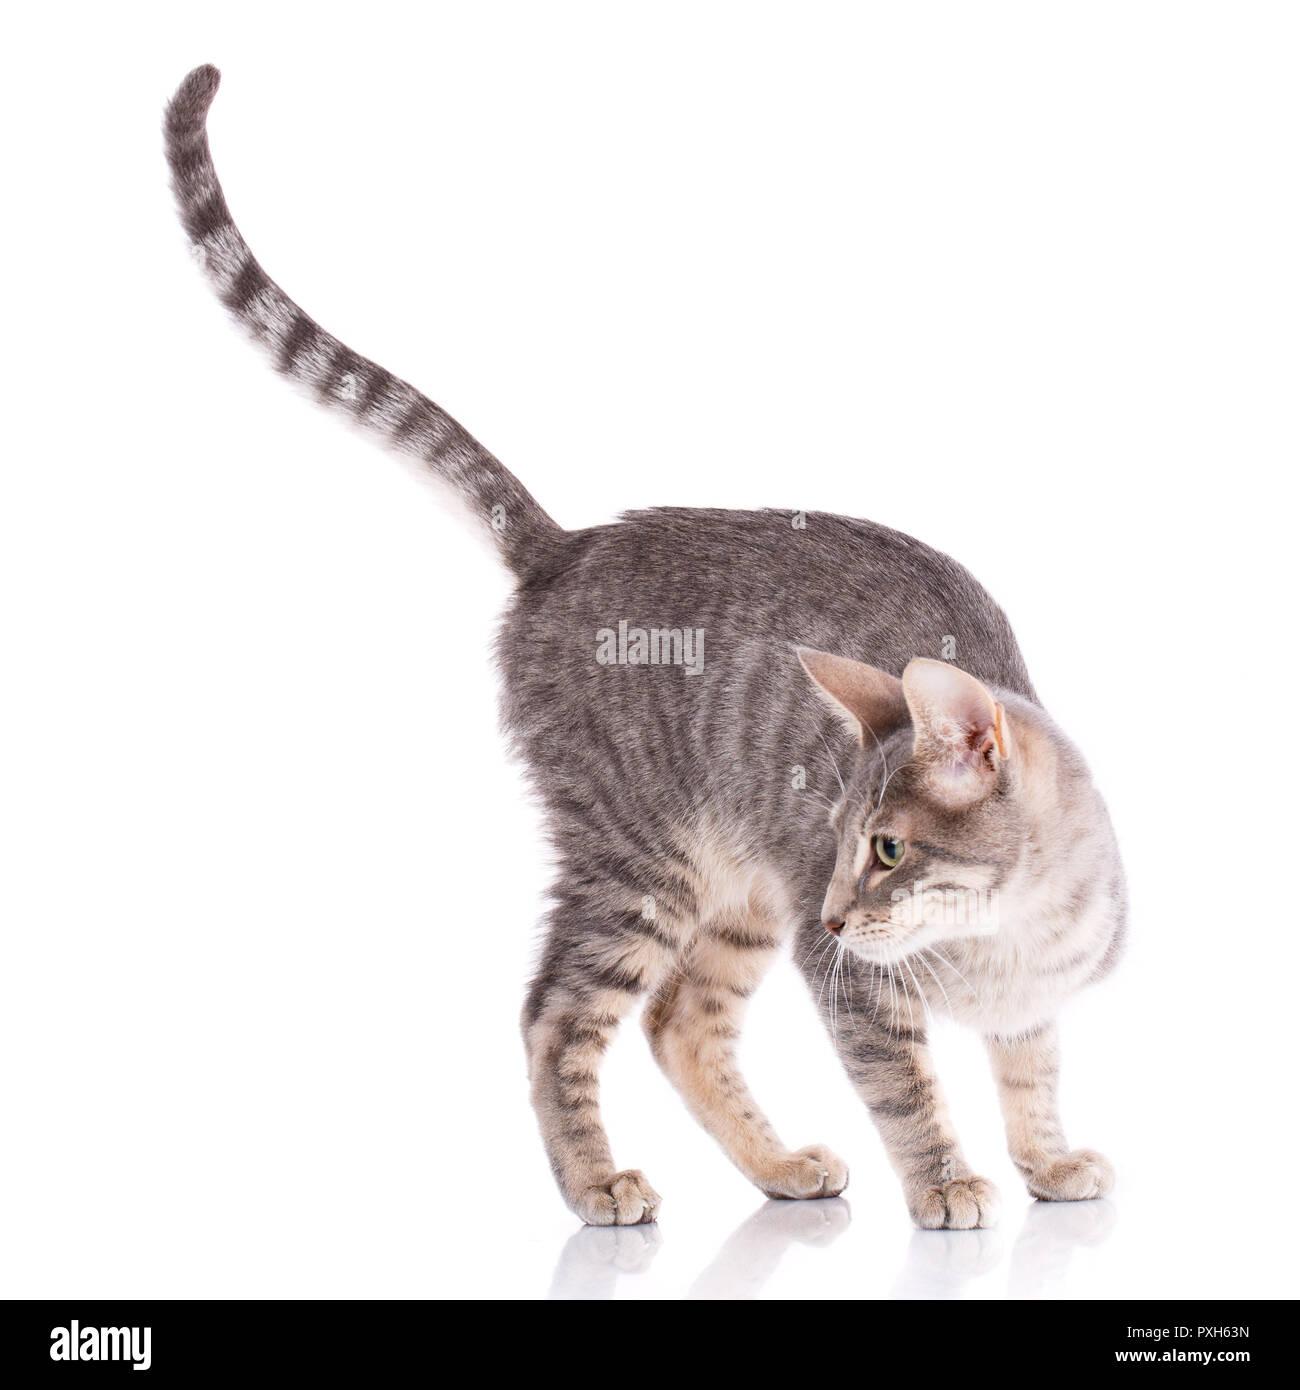 Serengeti thoroughbred cat on a white background - Stock Image